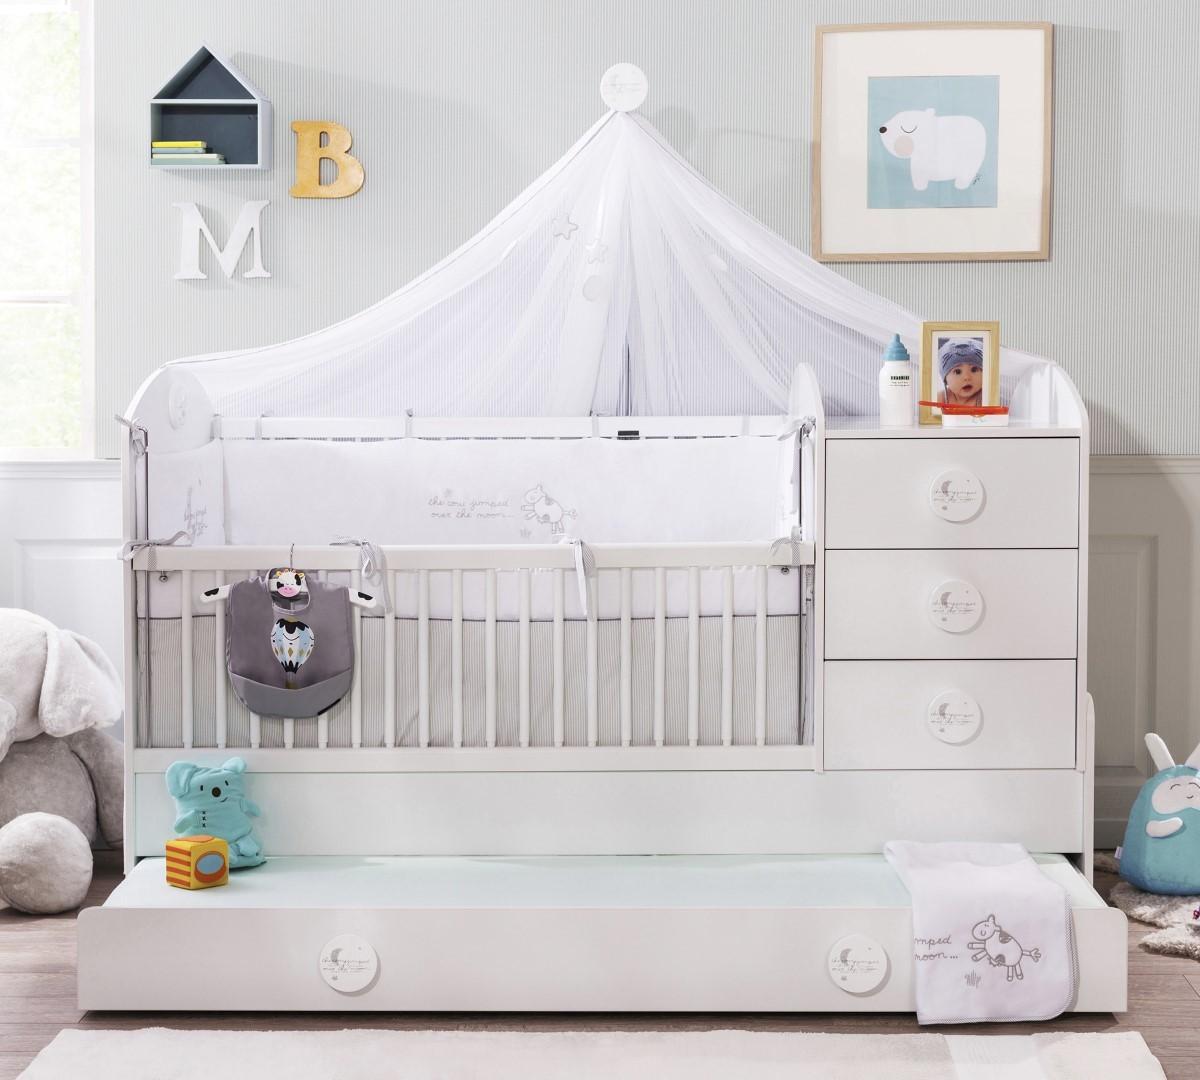 sachsa babykamer babybed ledikant meegroeibed 4 in 1 kinderkamer kinderbed terrashaard en. Black Bedroom Furniture Sets. Home Design Ideas